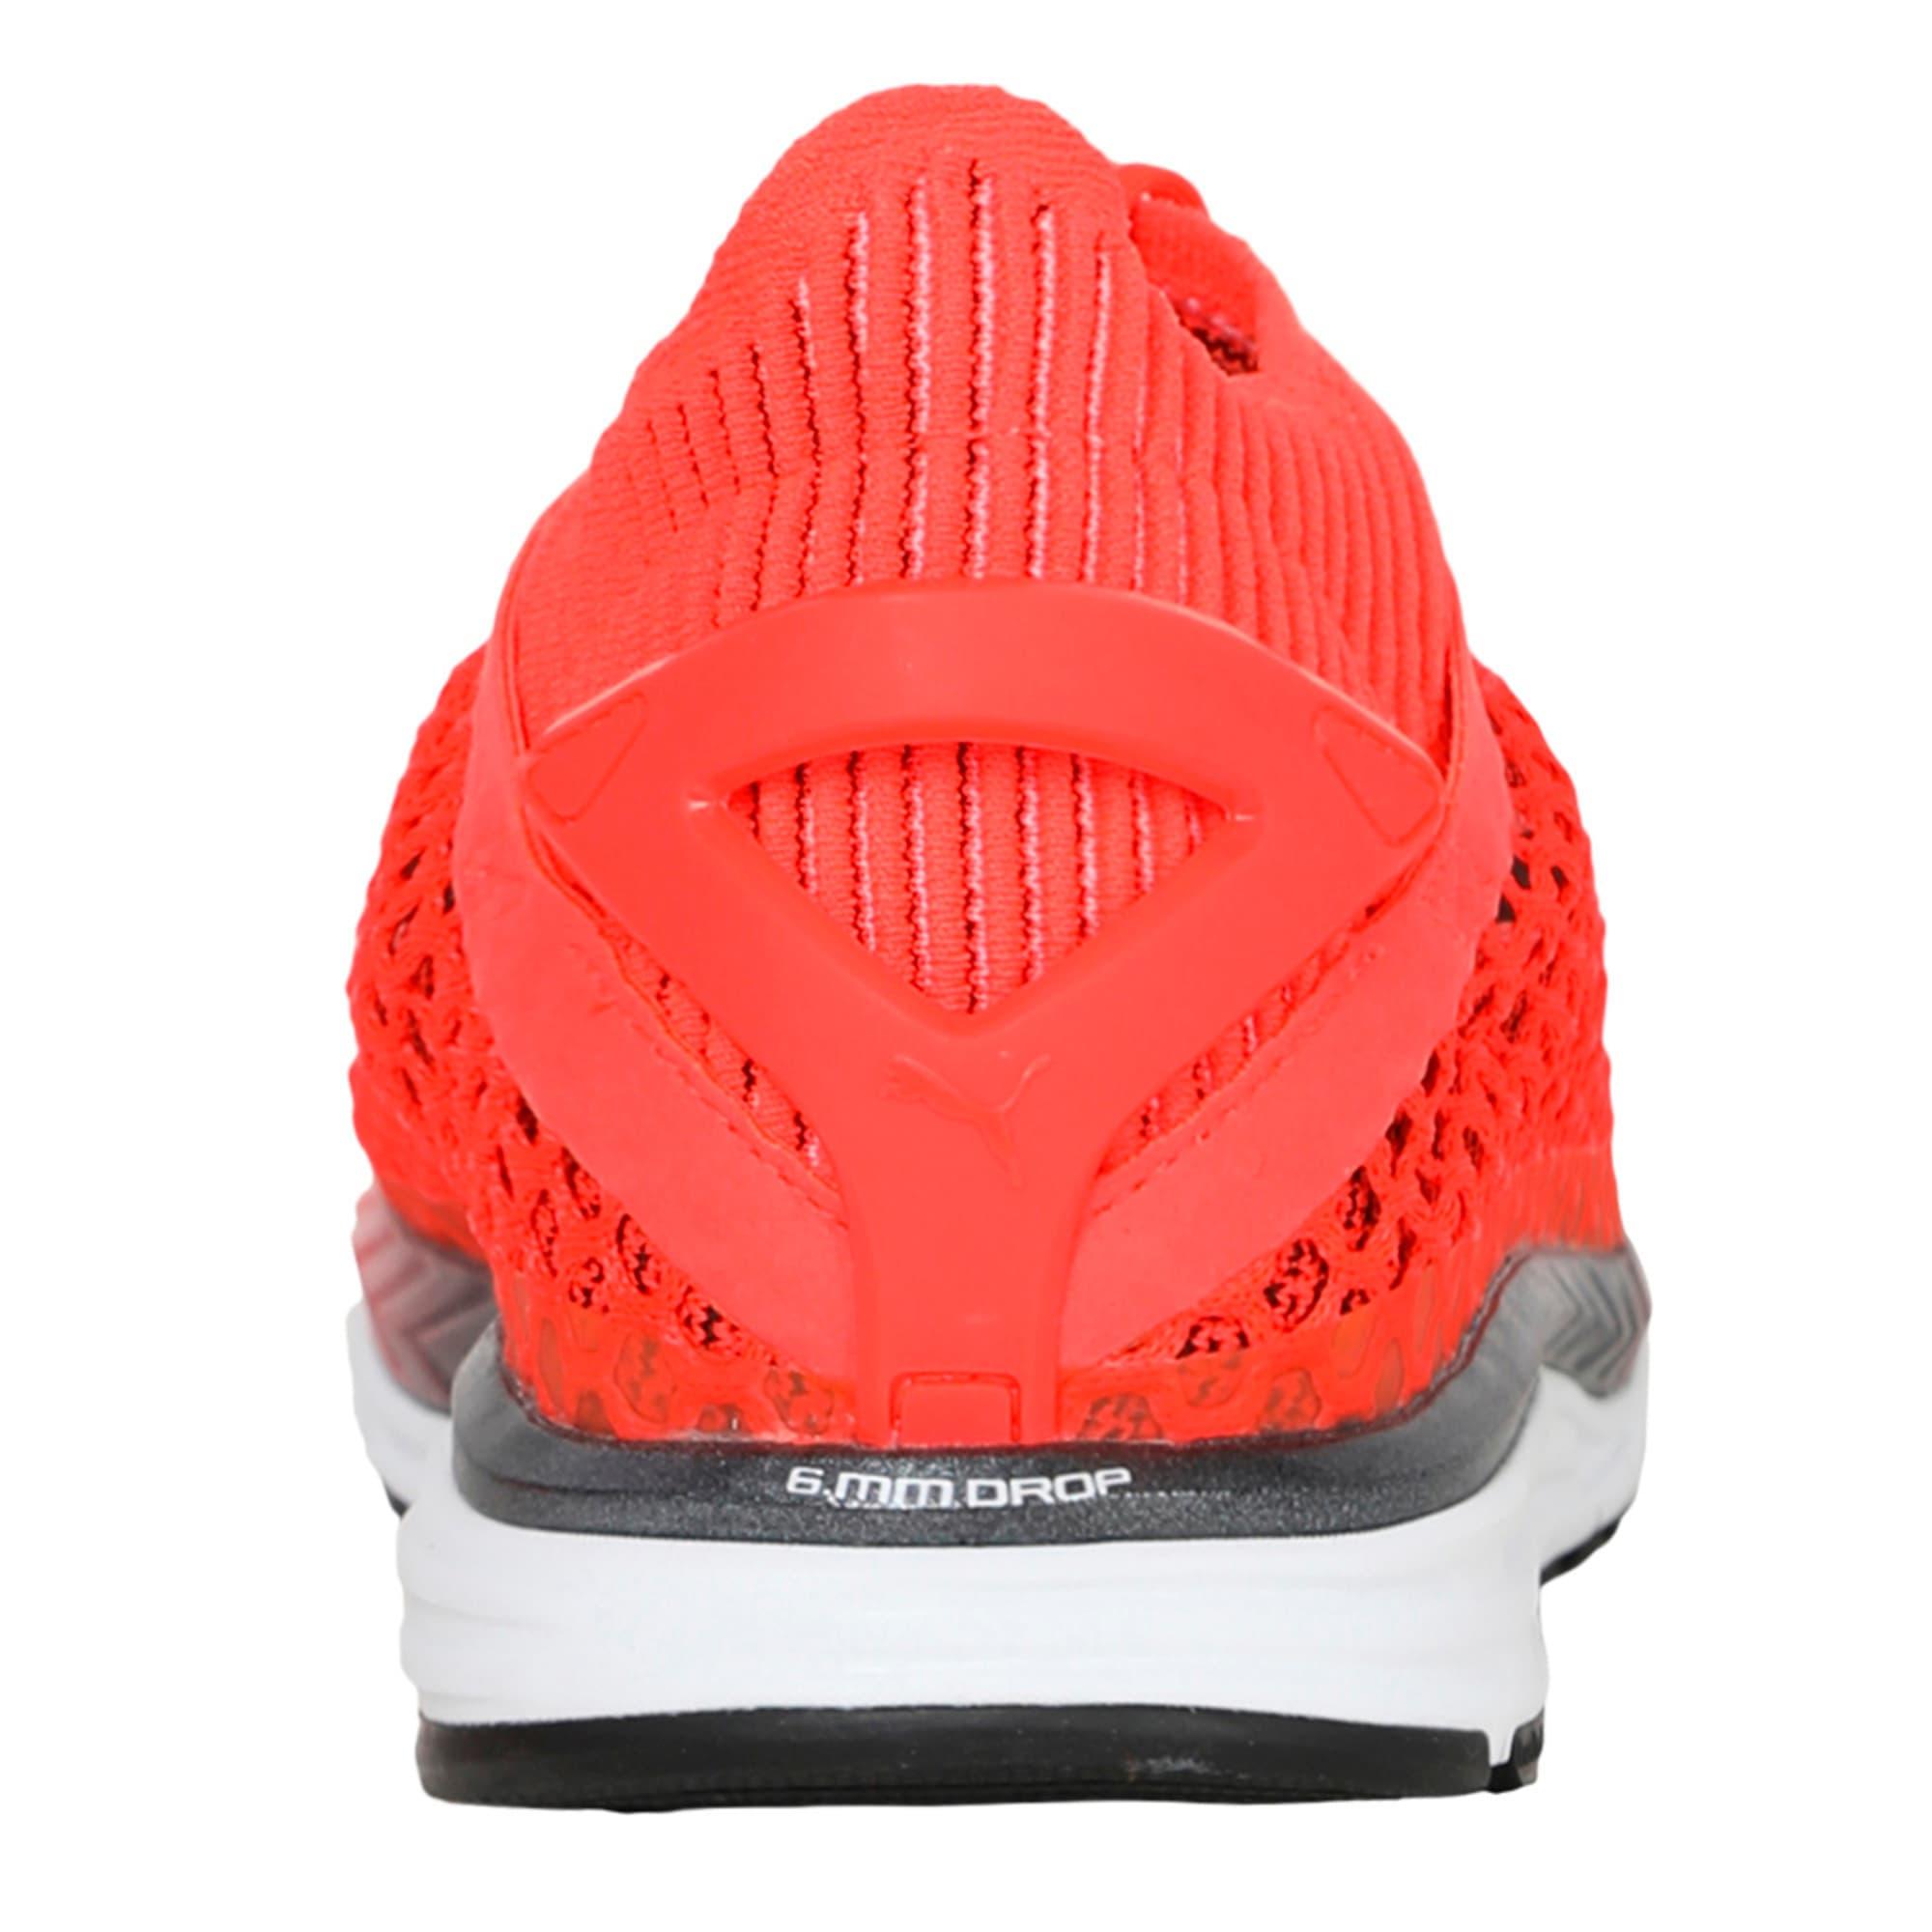 Thumbnail 4 of Speed IGNITE NETFIT 2 Men's Running Shoes, Red Blast-White-Black, medium-IND